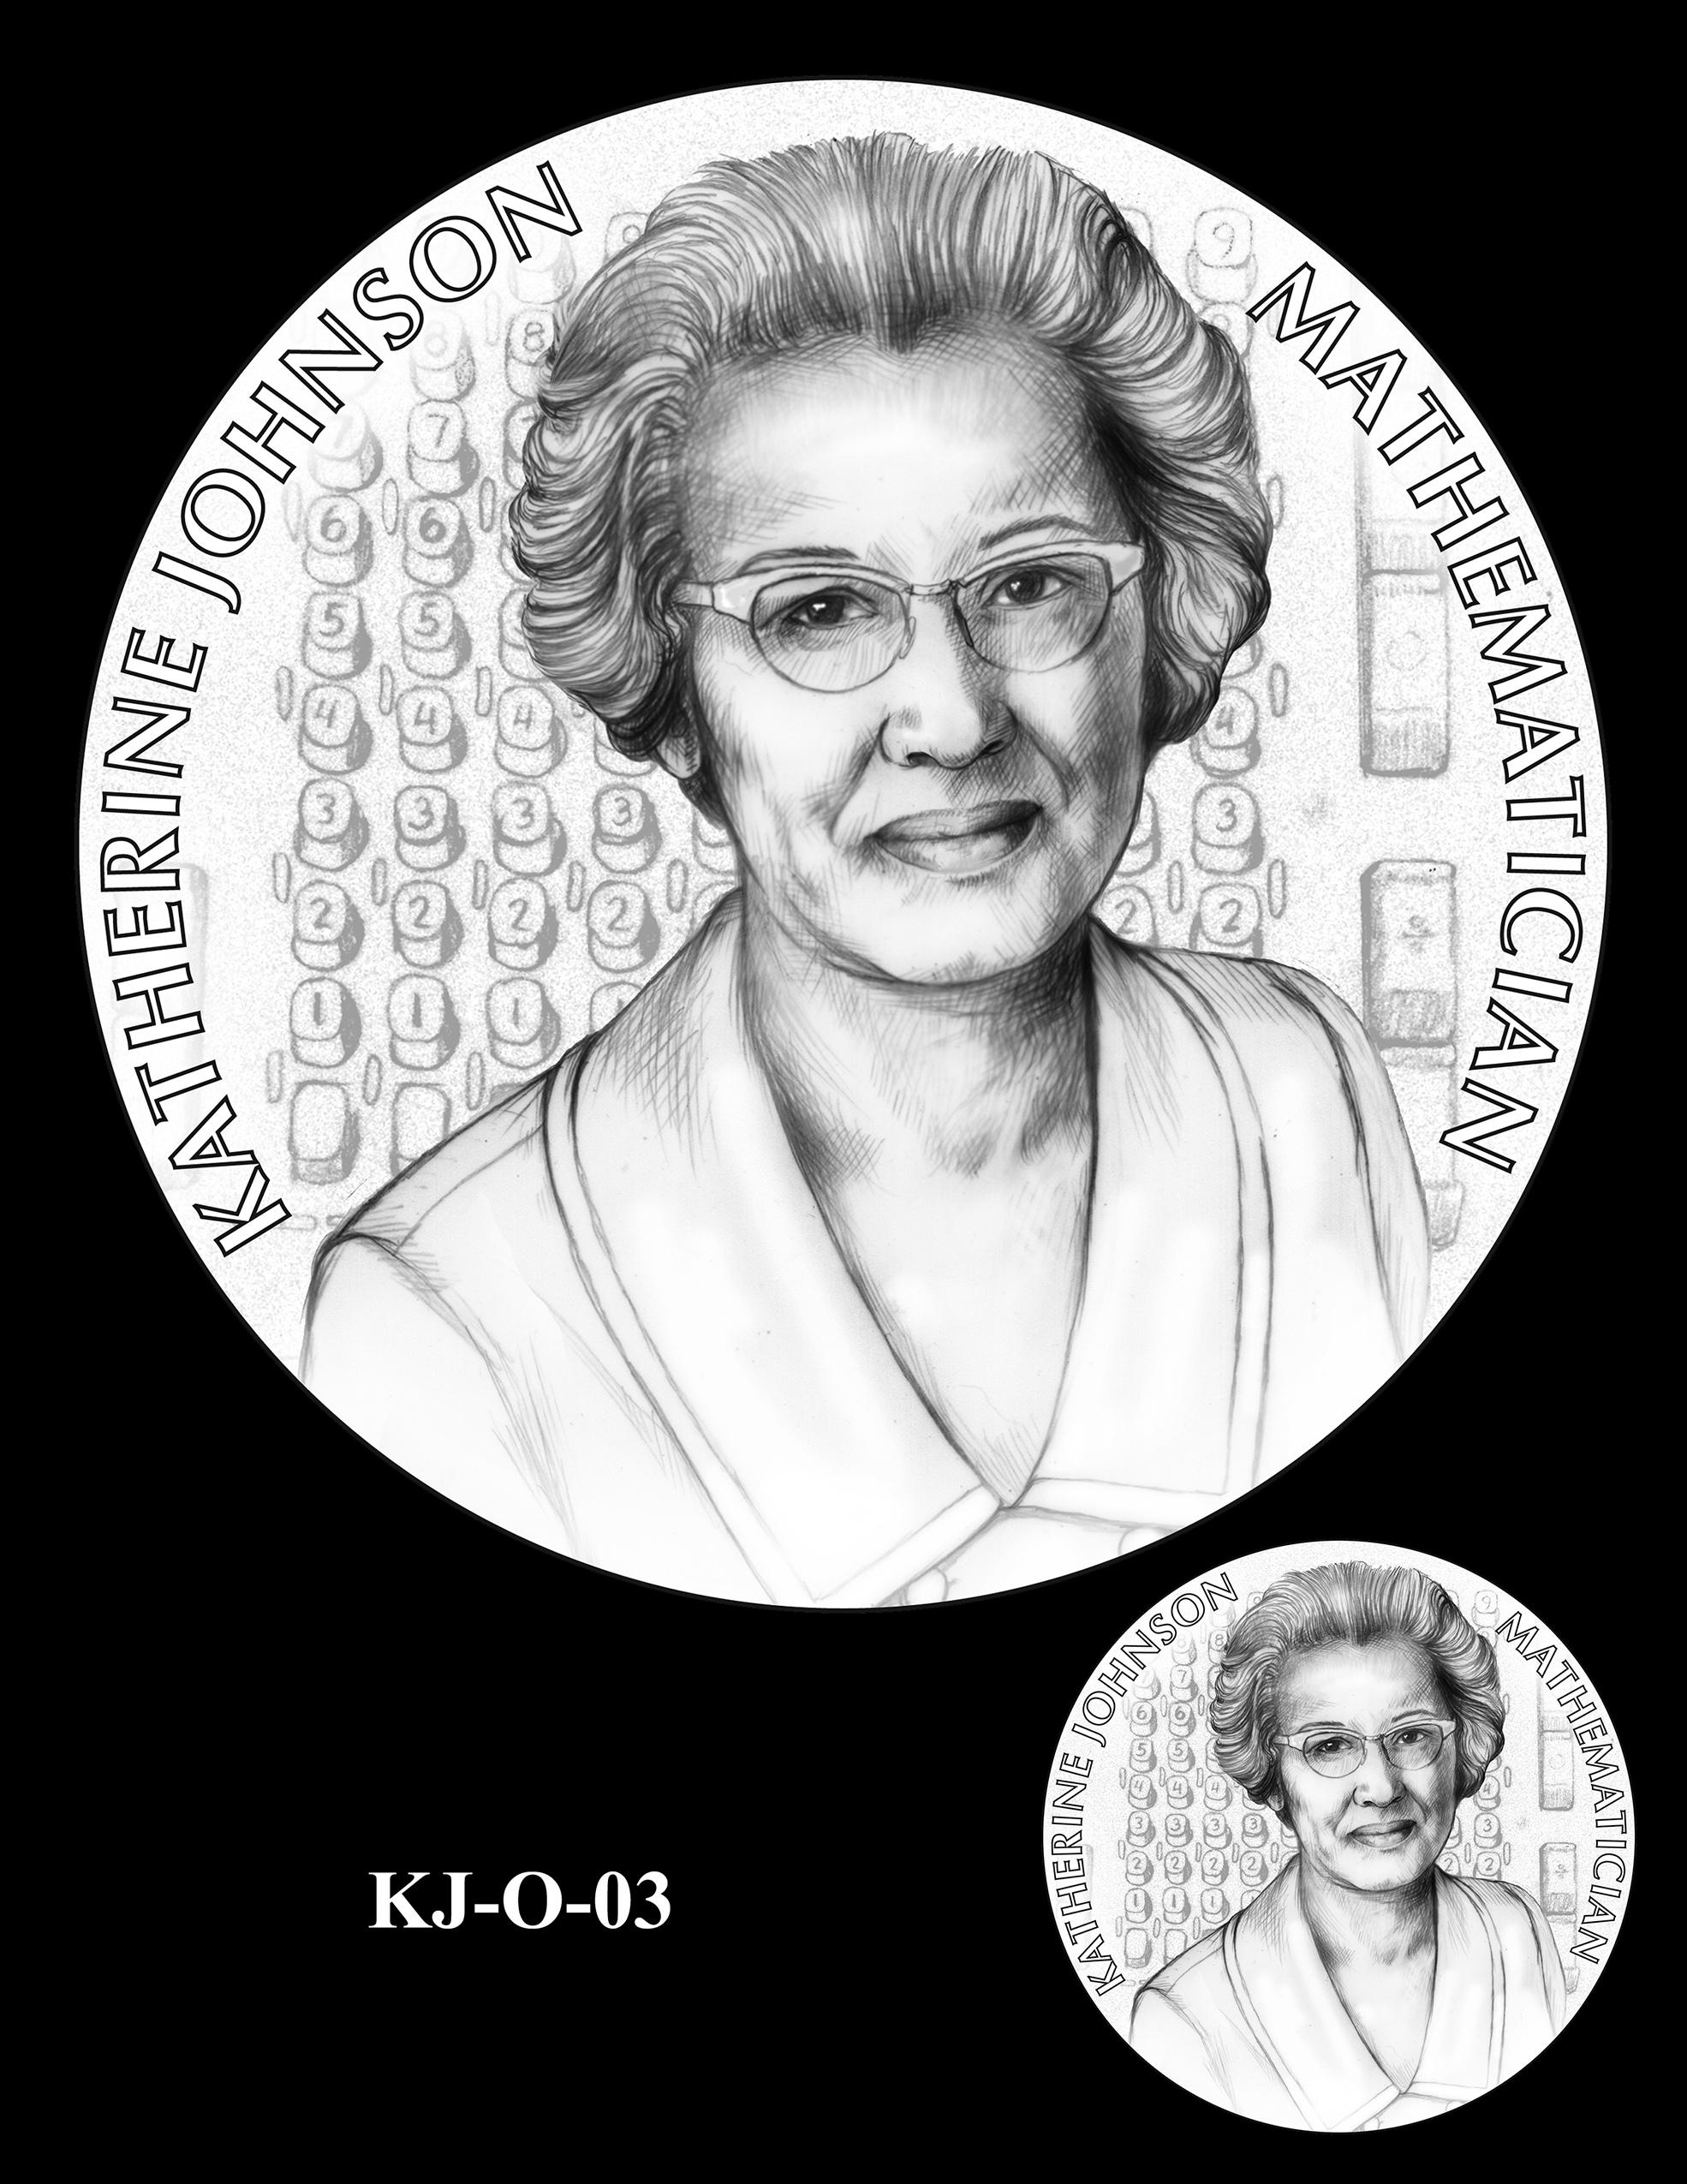 KJ-O-03 -- Katherine Johnson Congressional Gold Medal